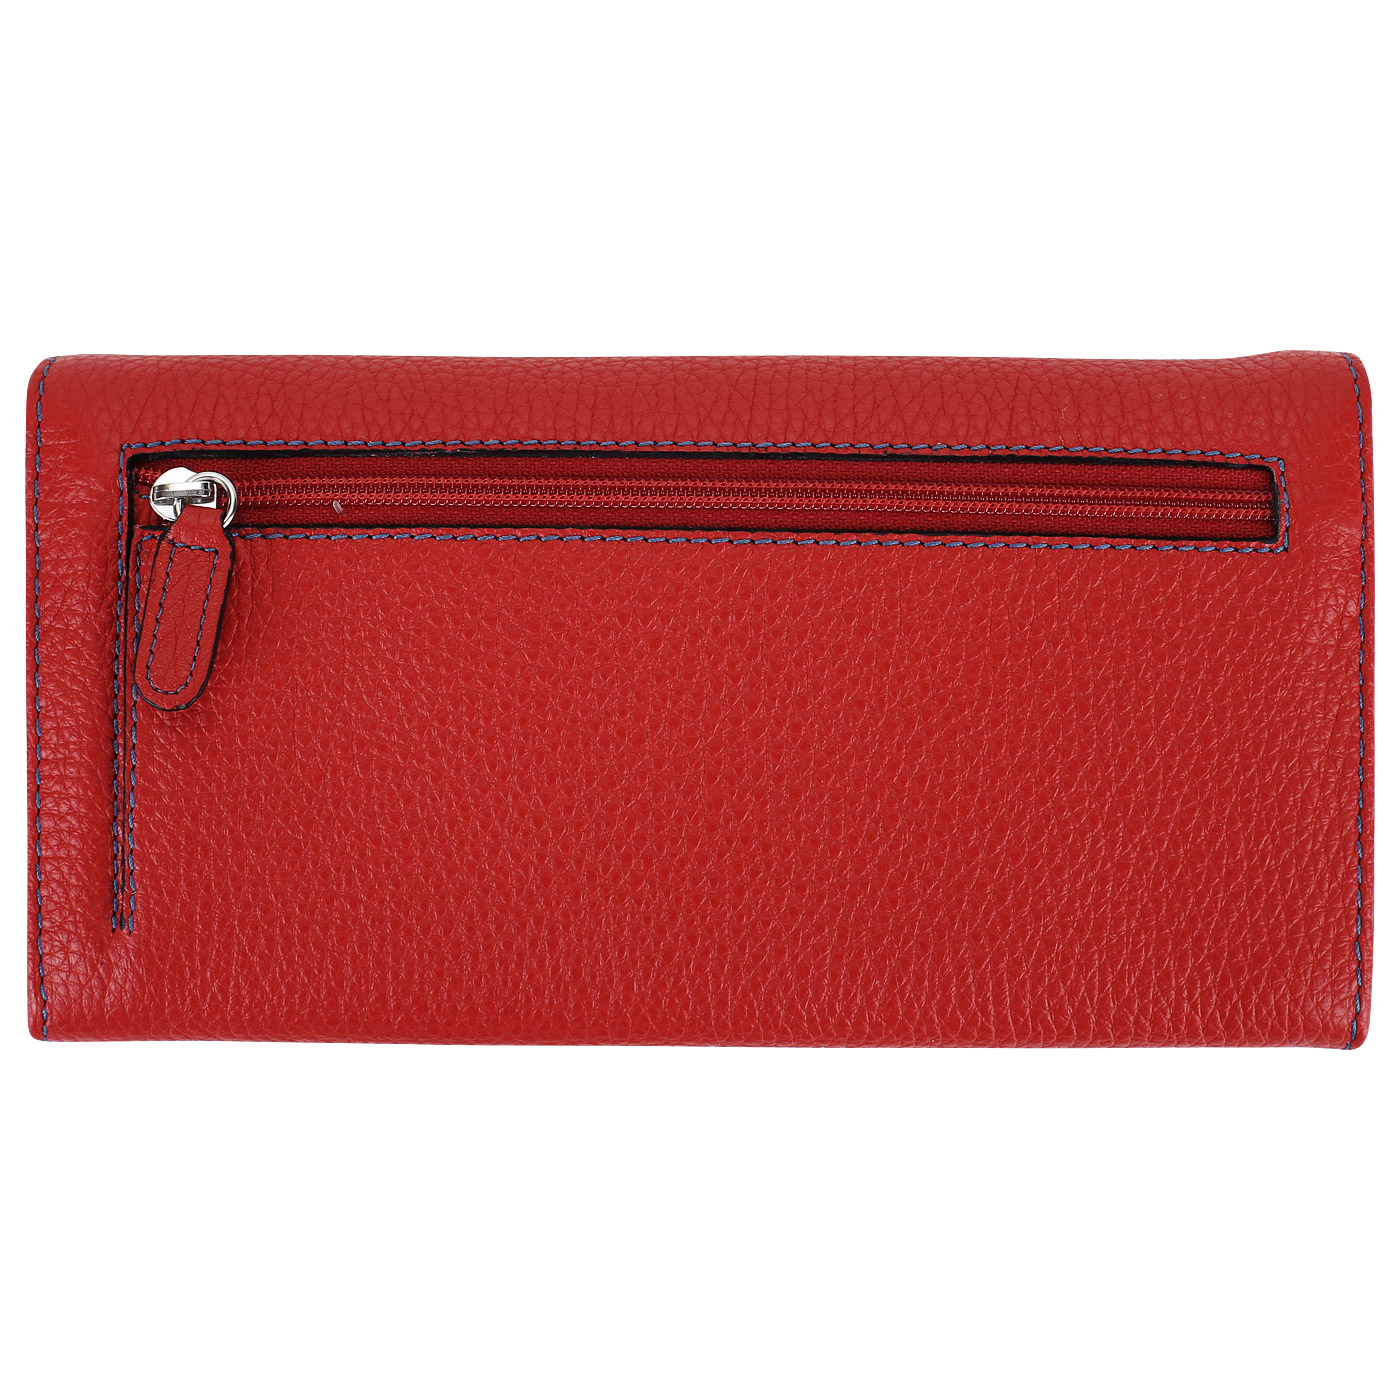 f494799a6c15 Красный кожаный кошелек Picard Dakota 1 8998 1E9_koralle ...